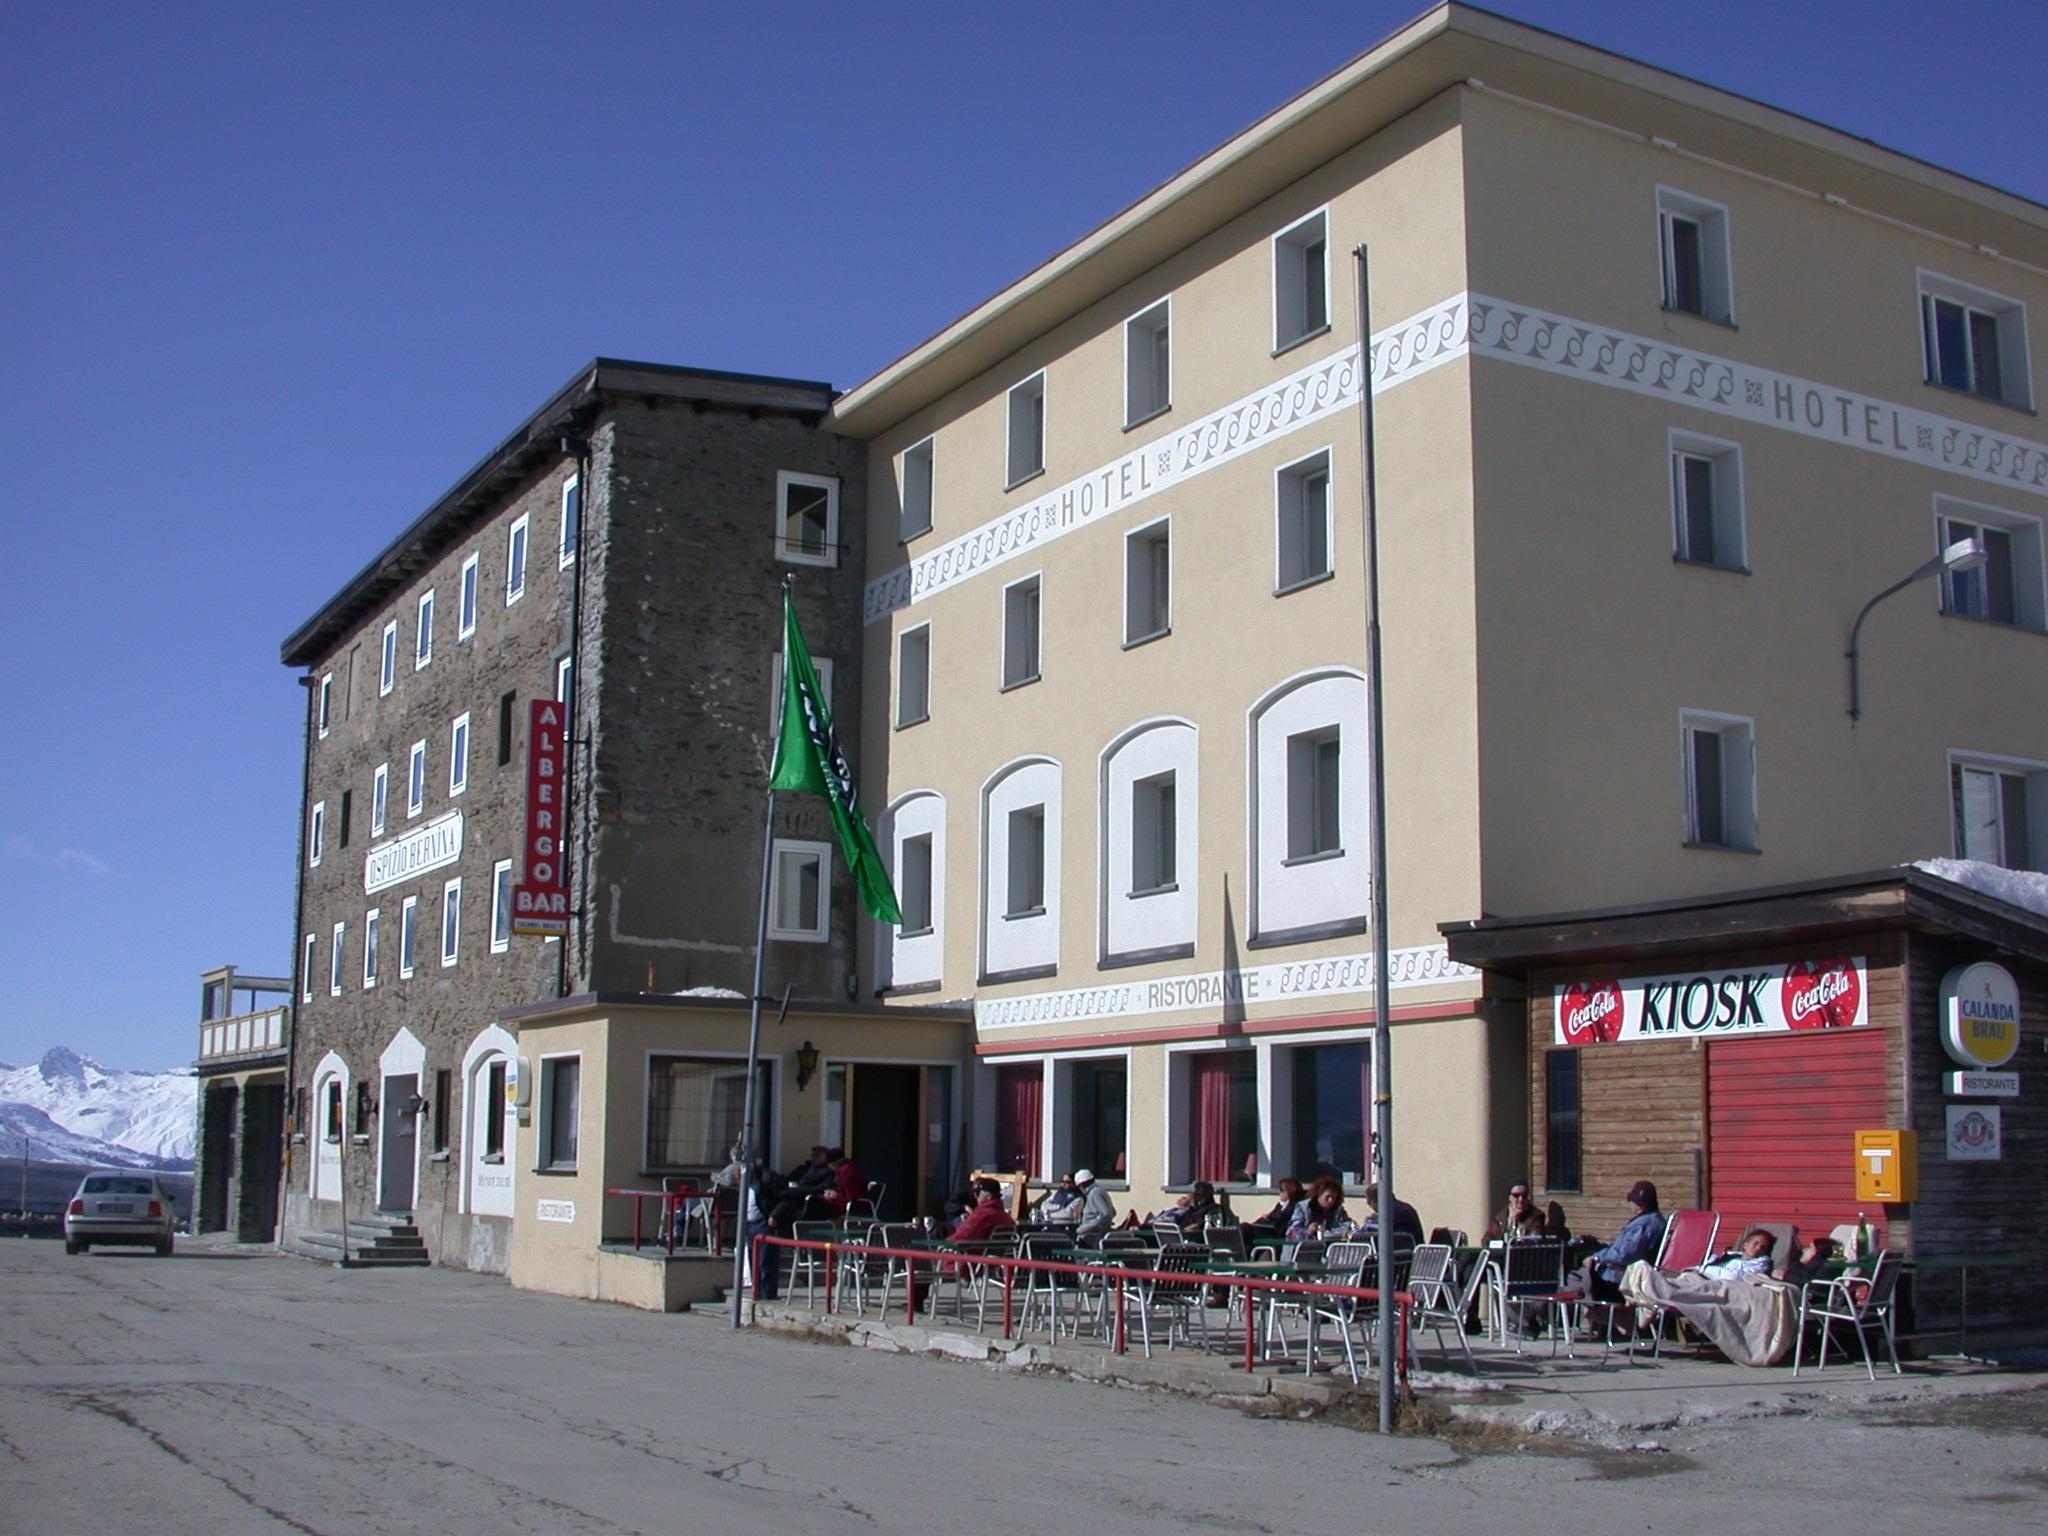 Ristorante Ospizio Bernina Slide 1